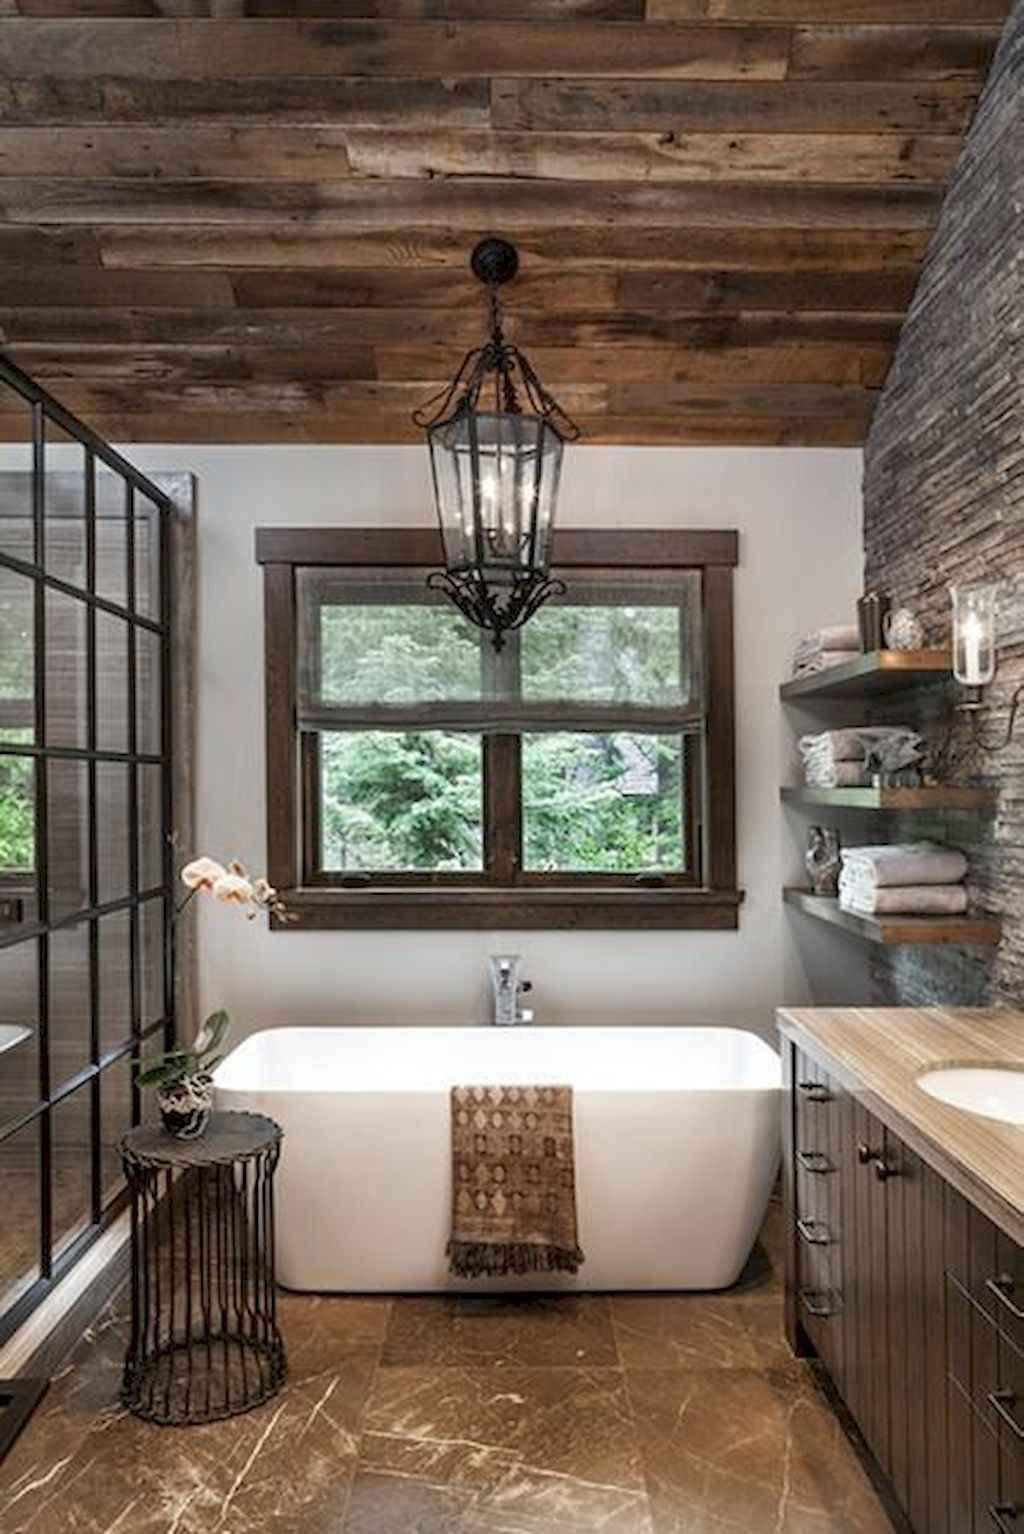 30 beautiful master bathroom remodel ideas in 2020 with on bathroom renovation ideas 2020 id=18977